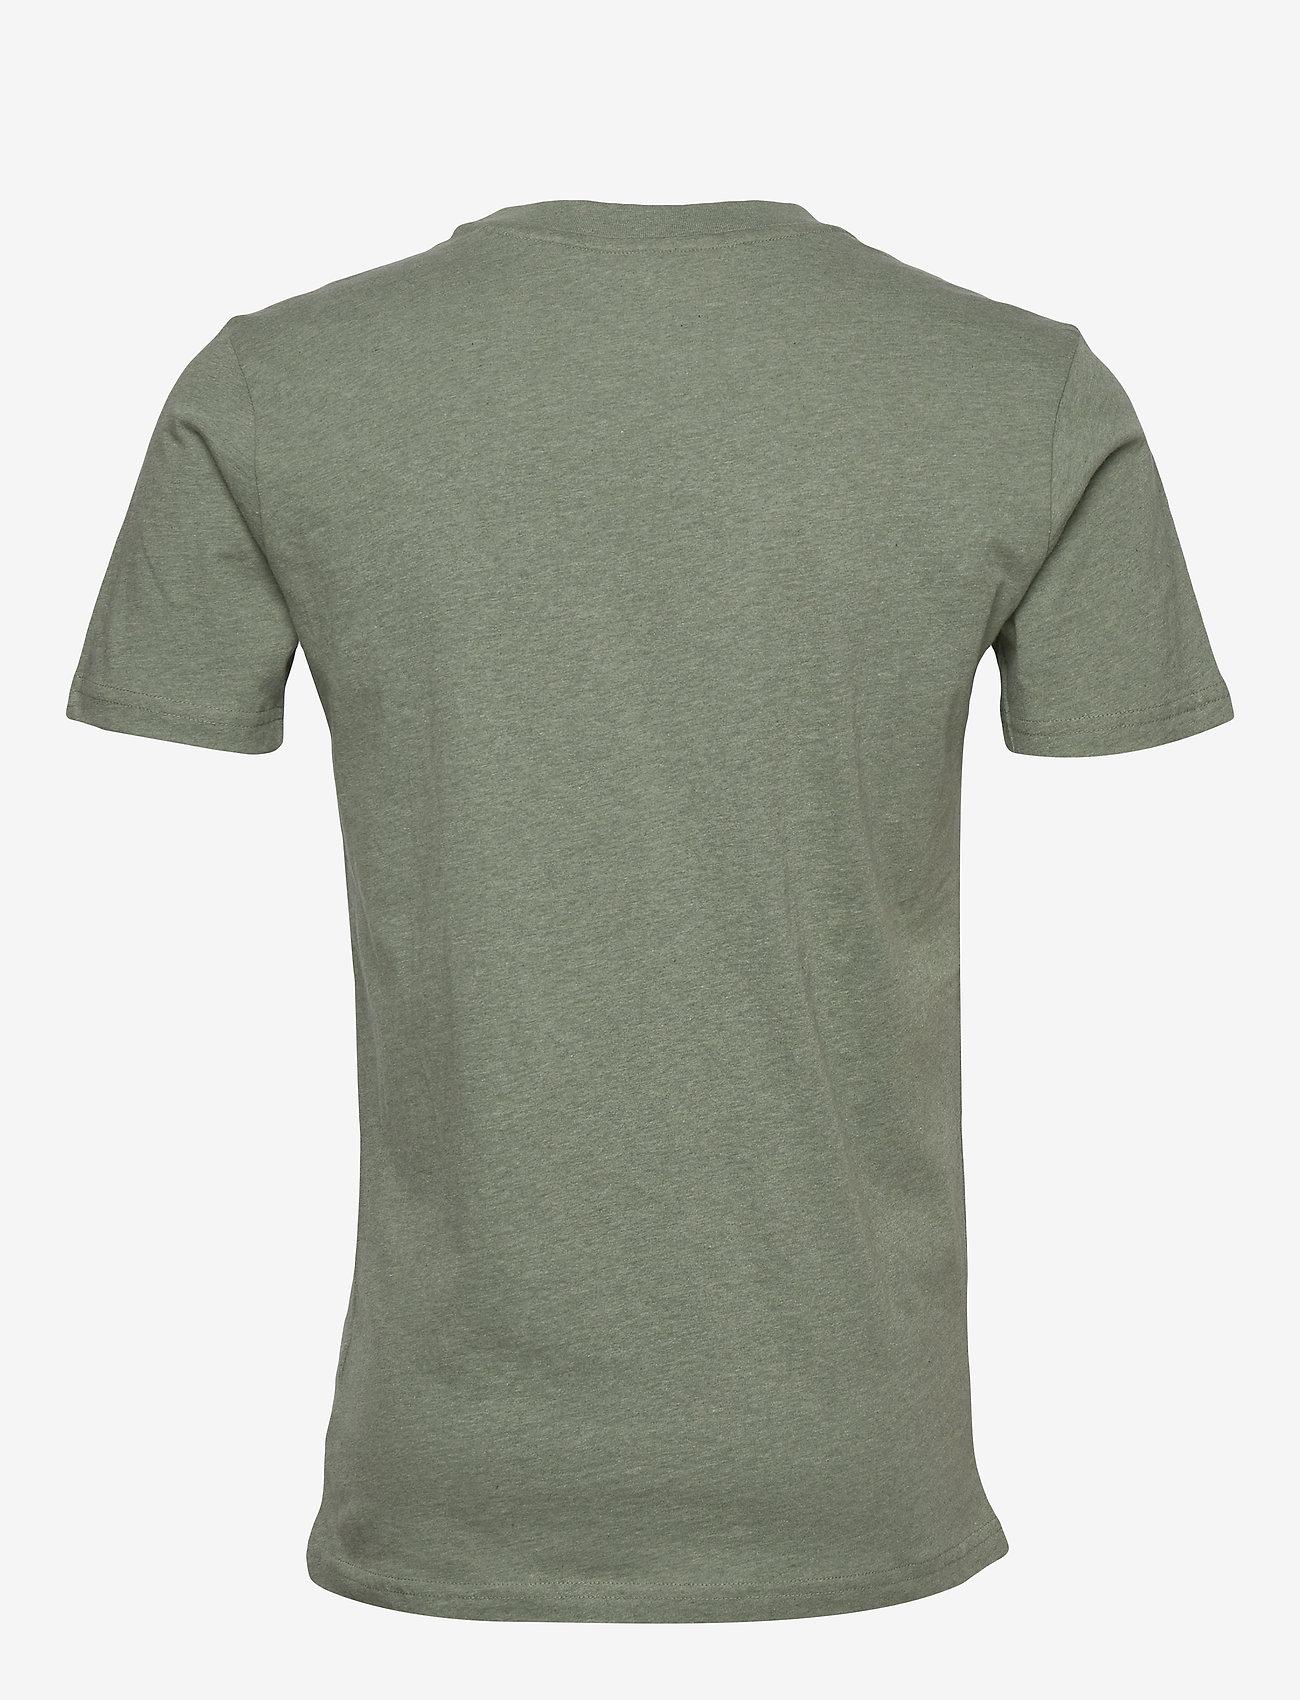 Knowledge Cotton Apparel ALDER big knowledge tee - GOTS/Vega - T-skjorter GREN MELANGE - Menn Klær